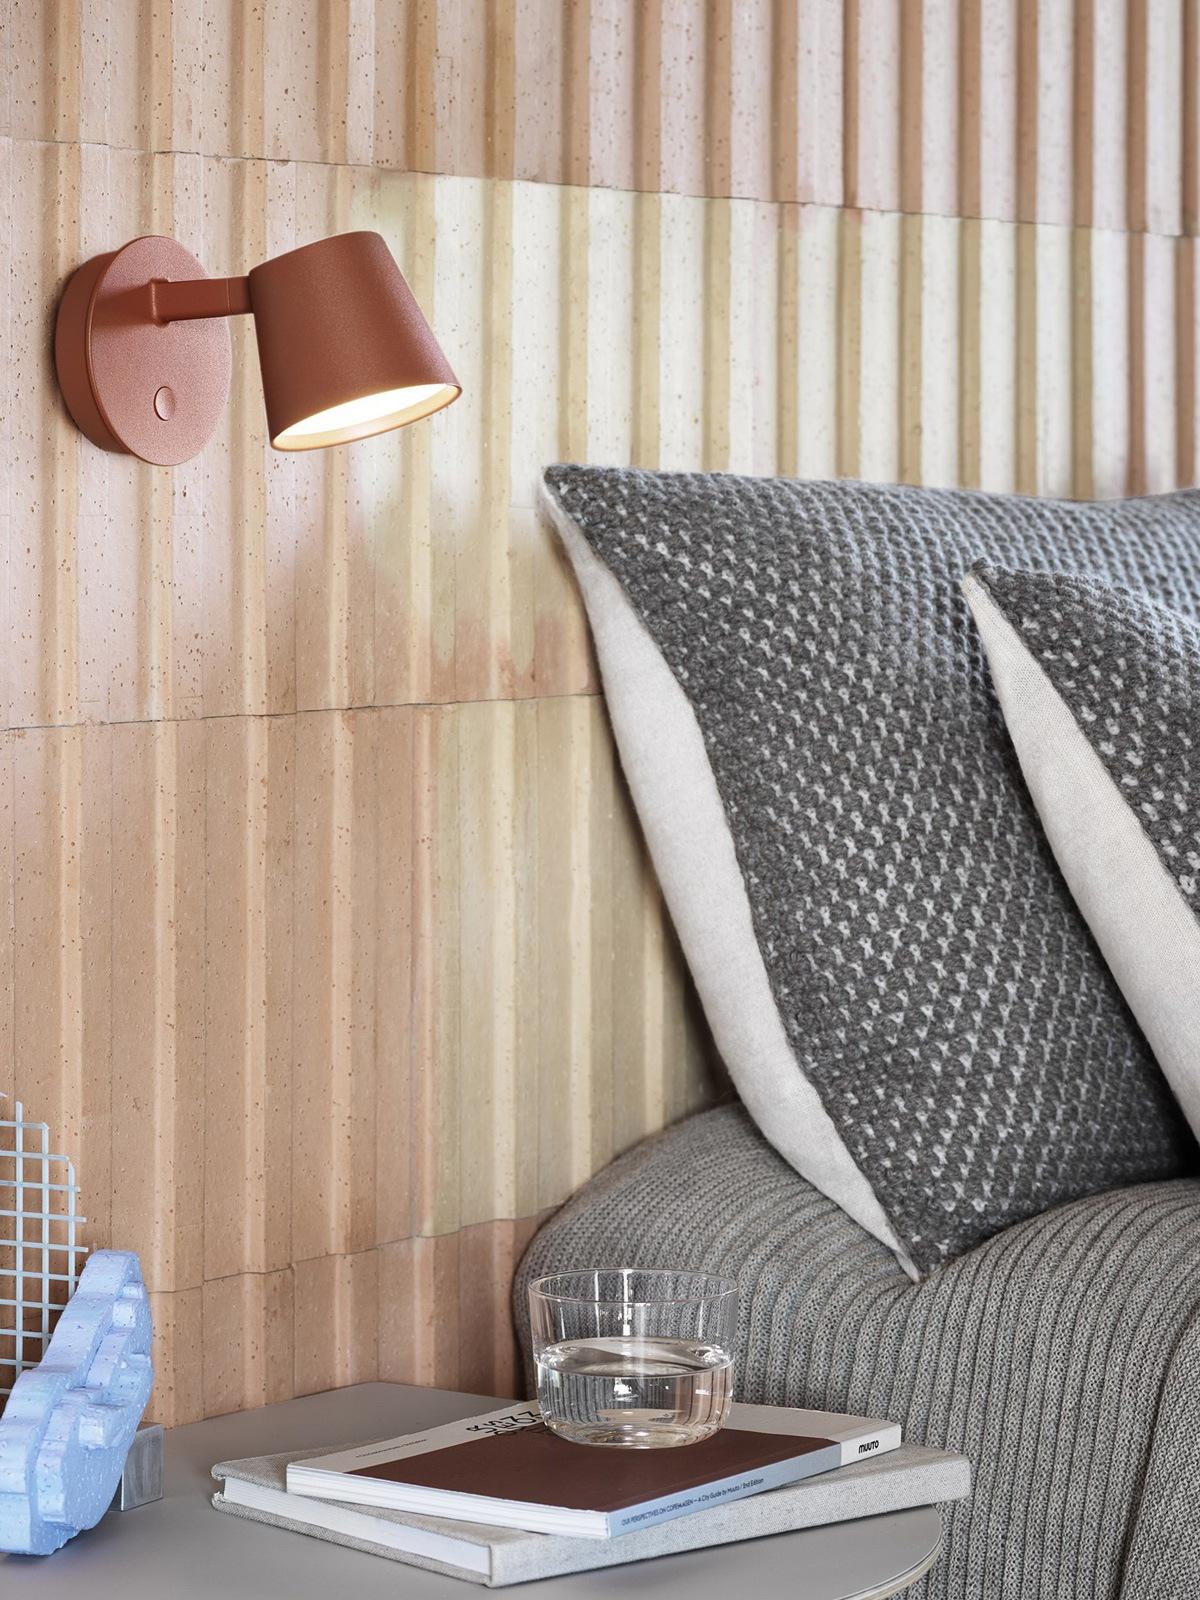 Tip Wall Lamp muuto Wandleuchte DesignOrt Onlineshop Lampen Berlin